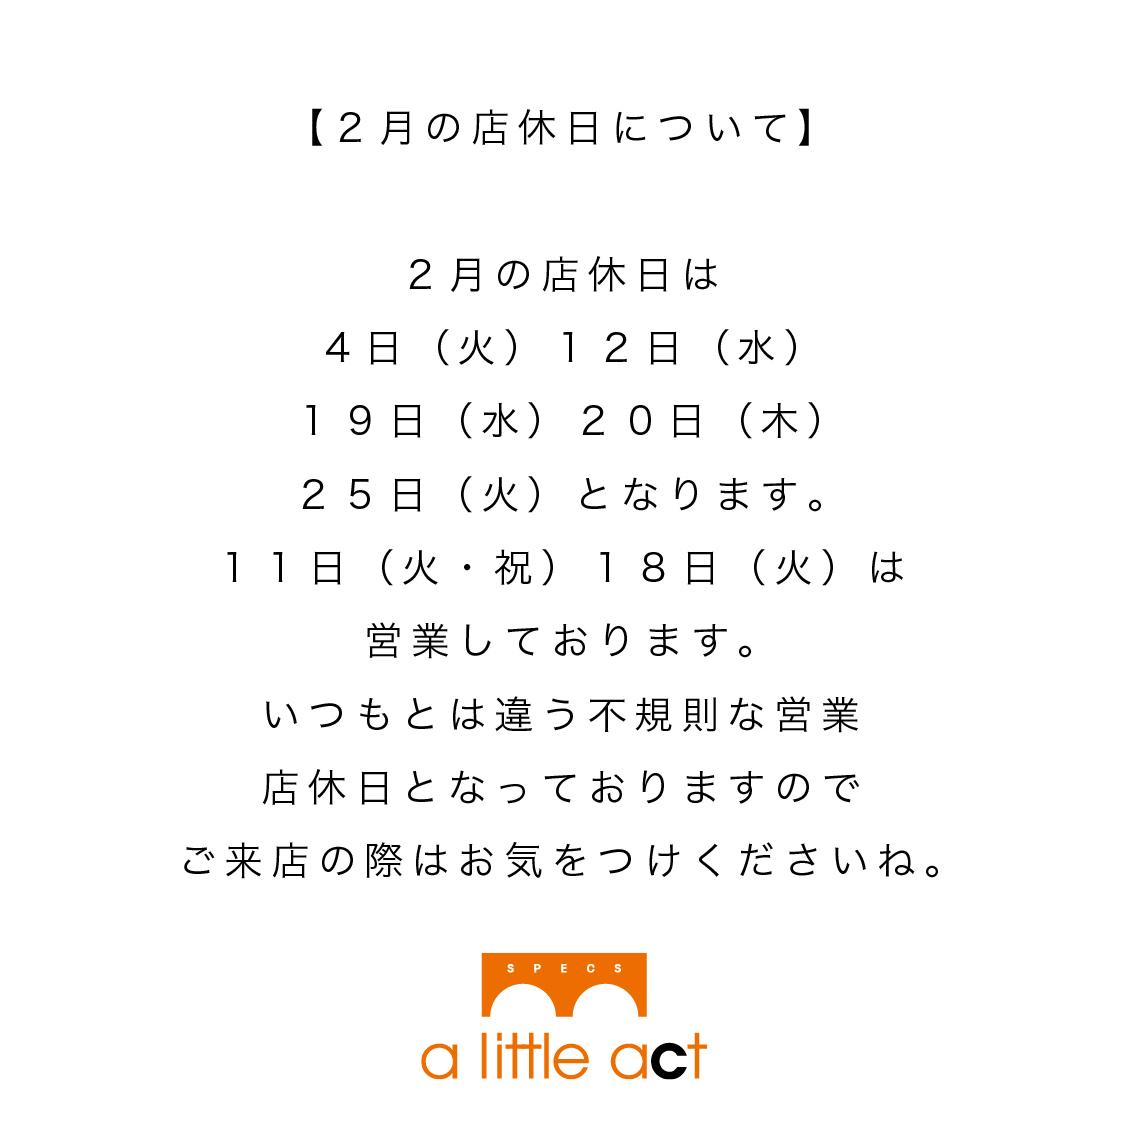 f:id:alittleact:20200201202059j:plain